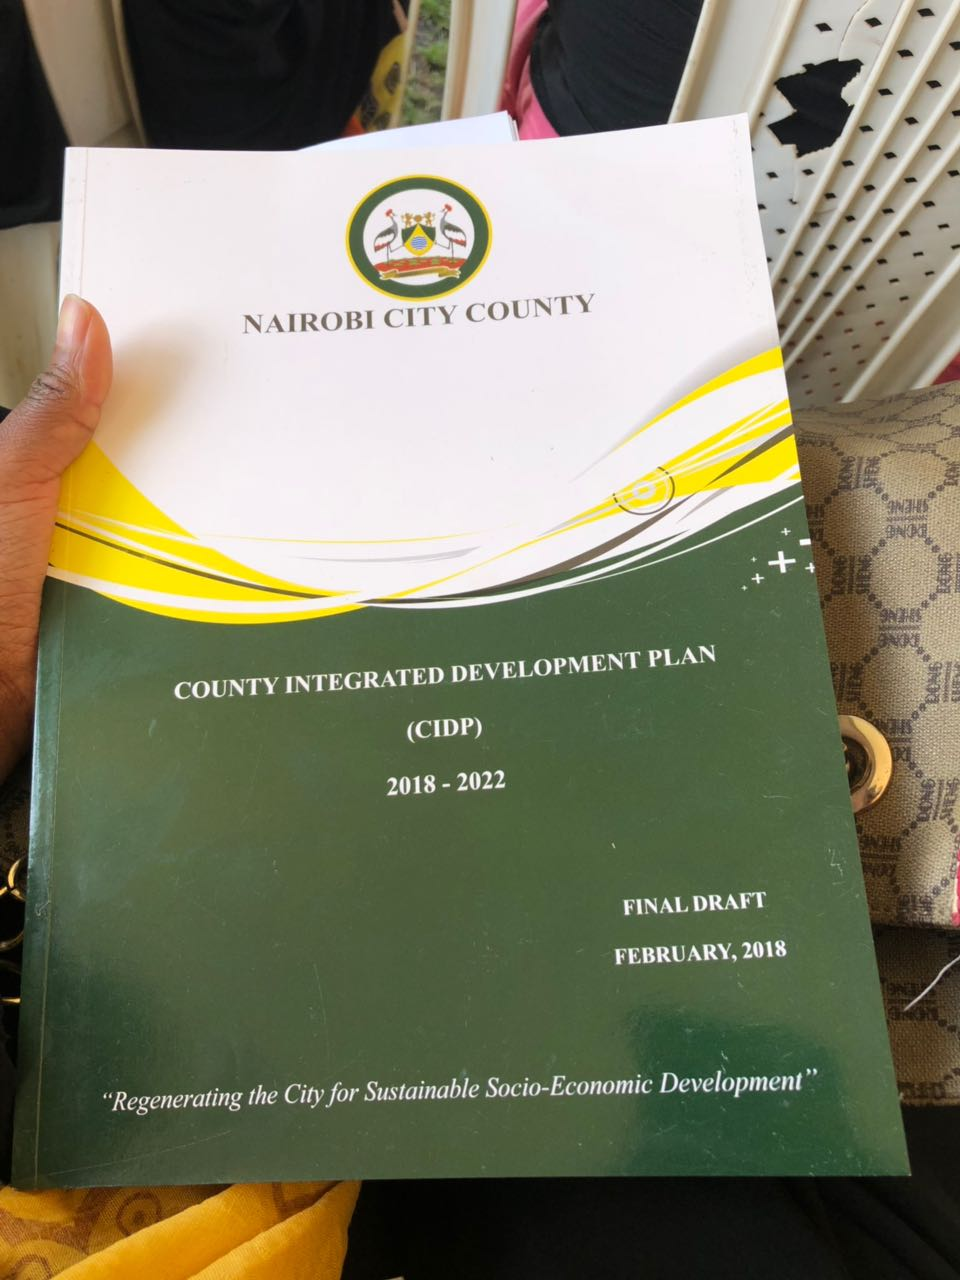 Photo: Nairobi City County Integrated Development Plan 2018-2022